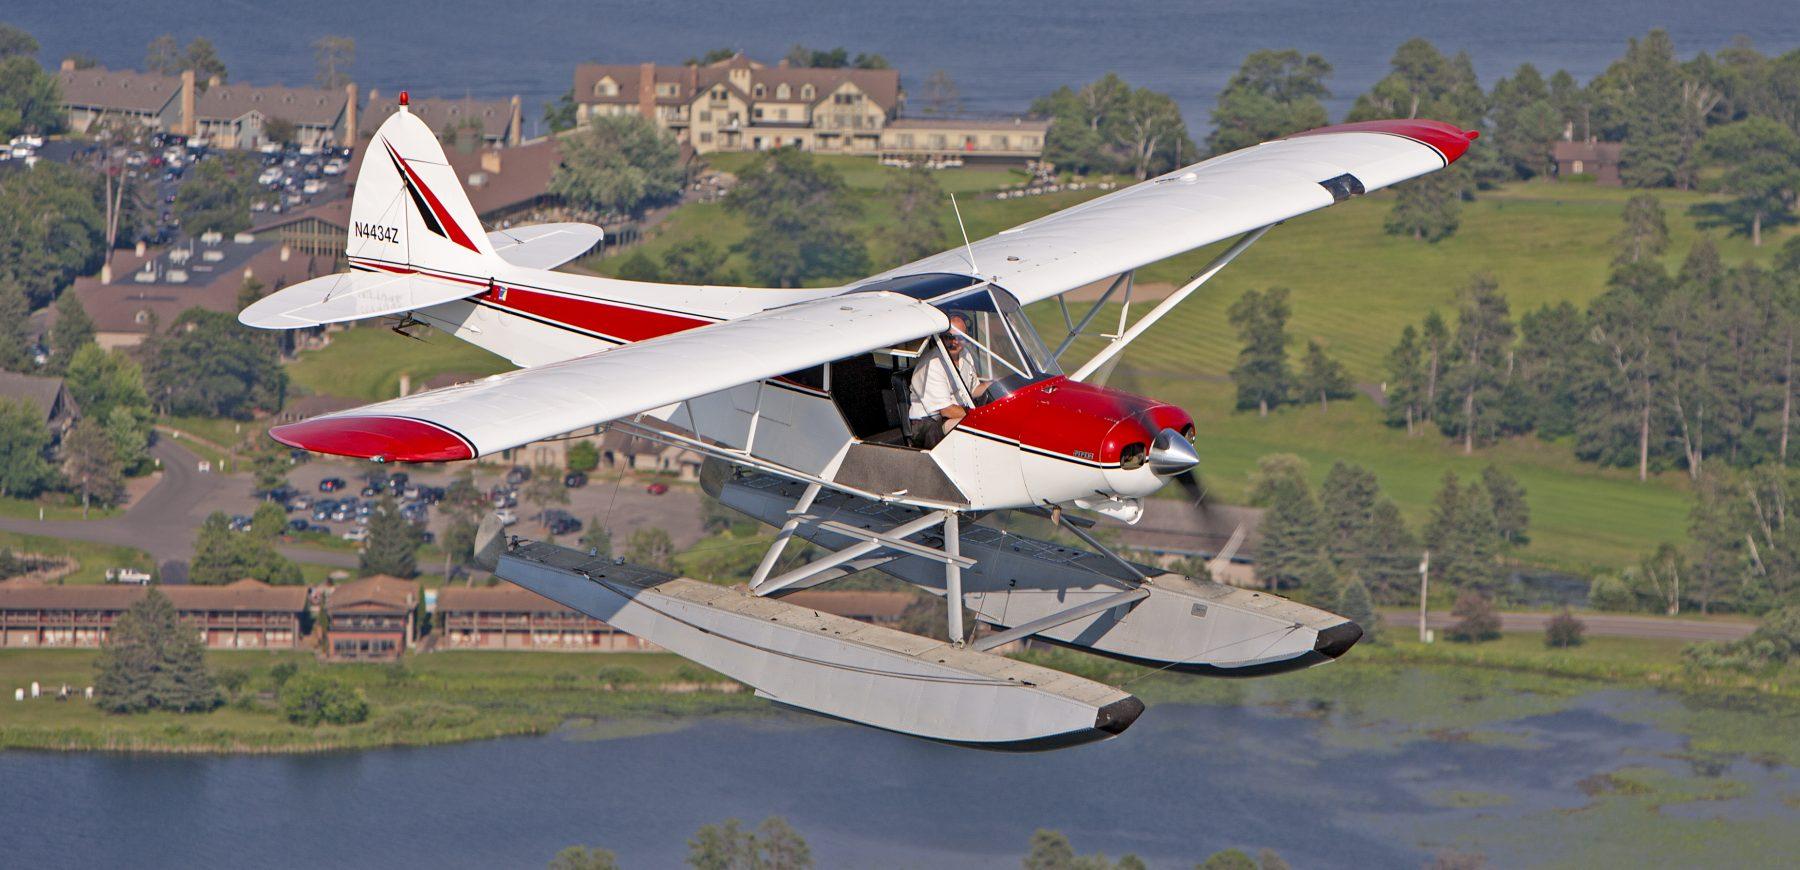 Super Cub Seaplane in Flight over Madden's on Gull Lake